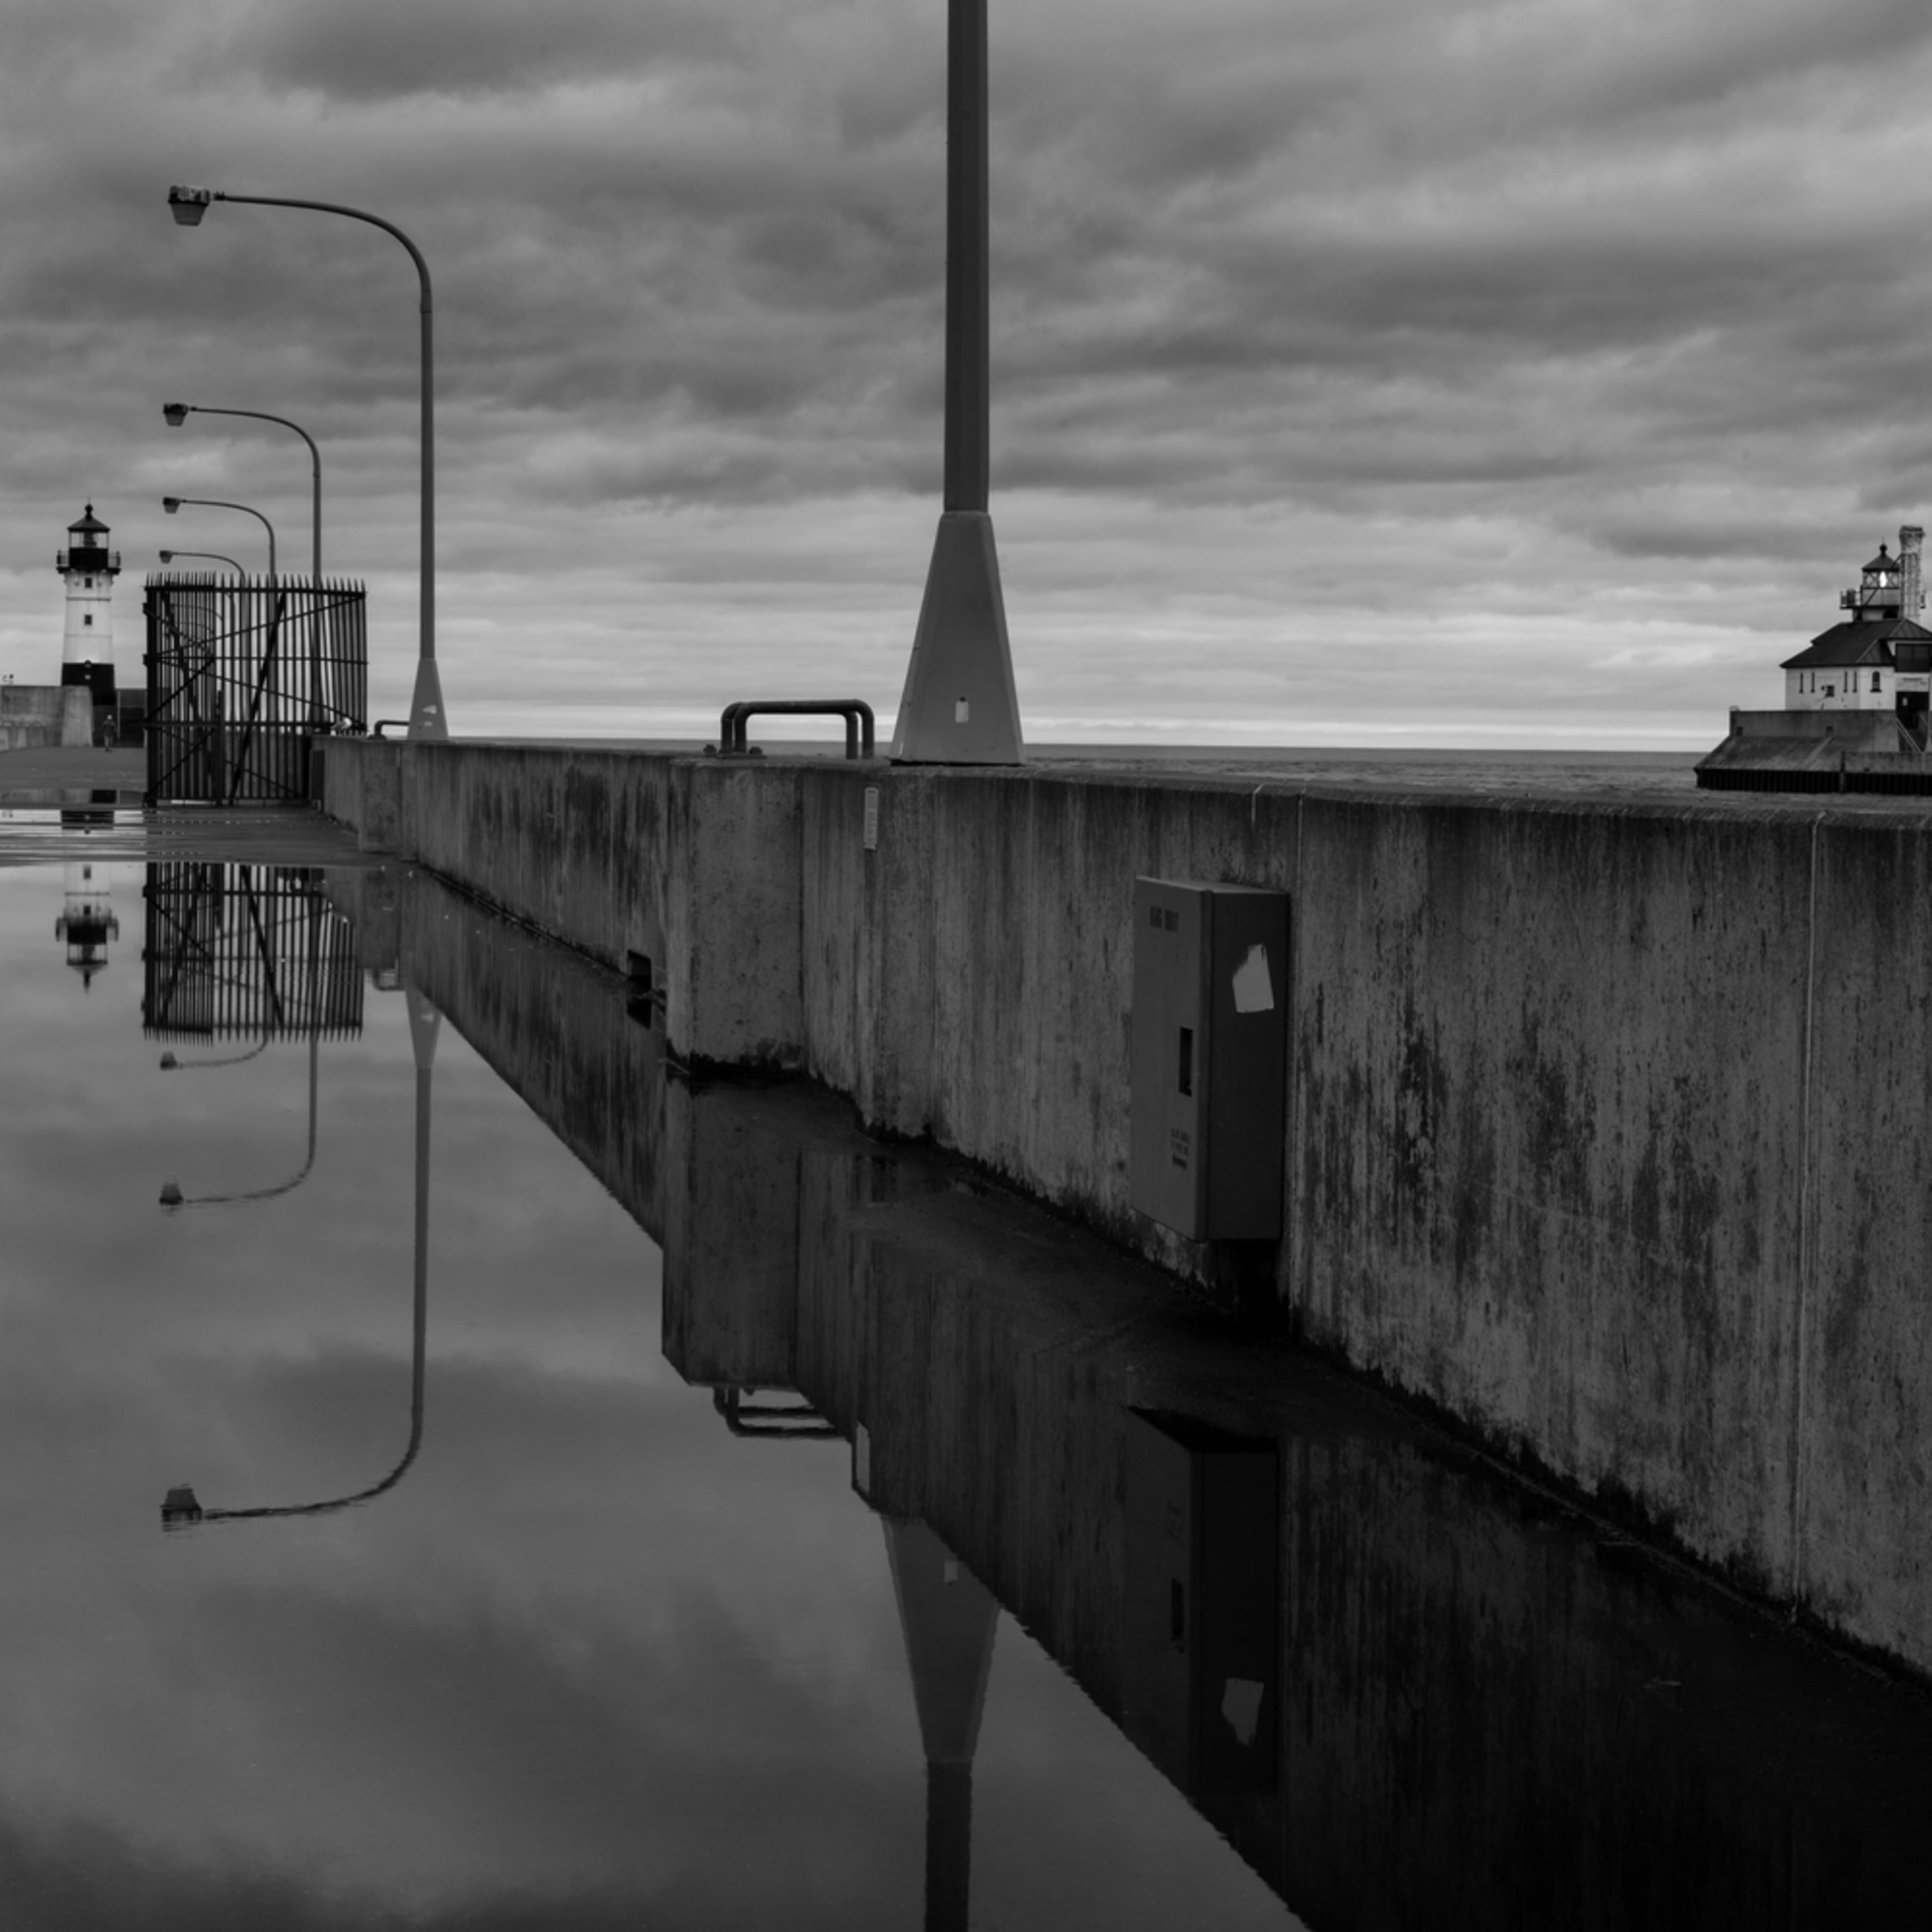 Dp624 duluth north canal walk b w l6umle